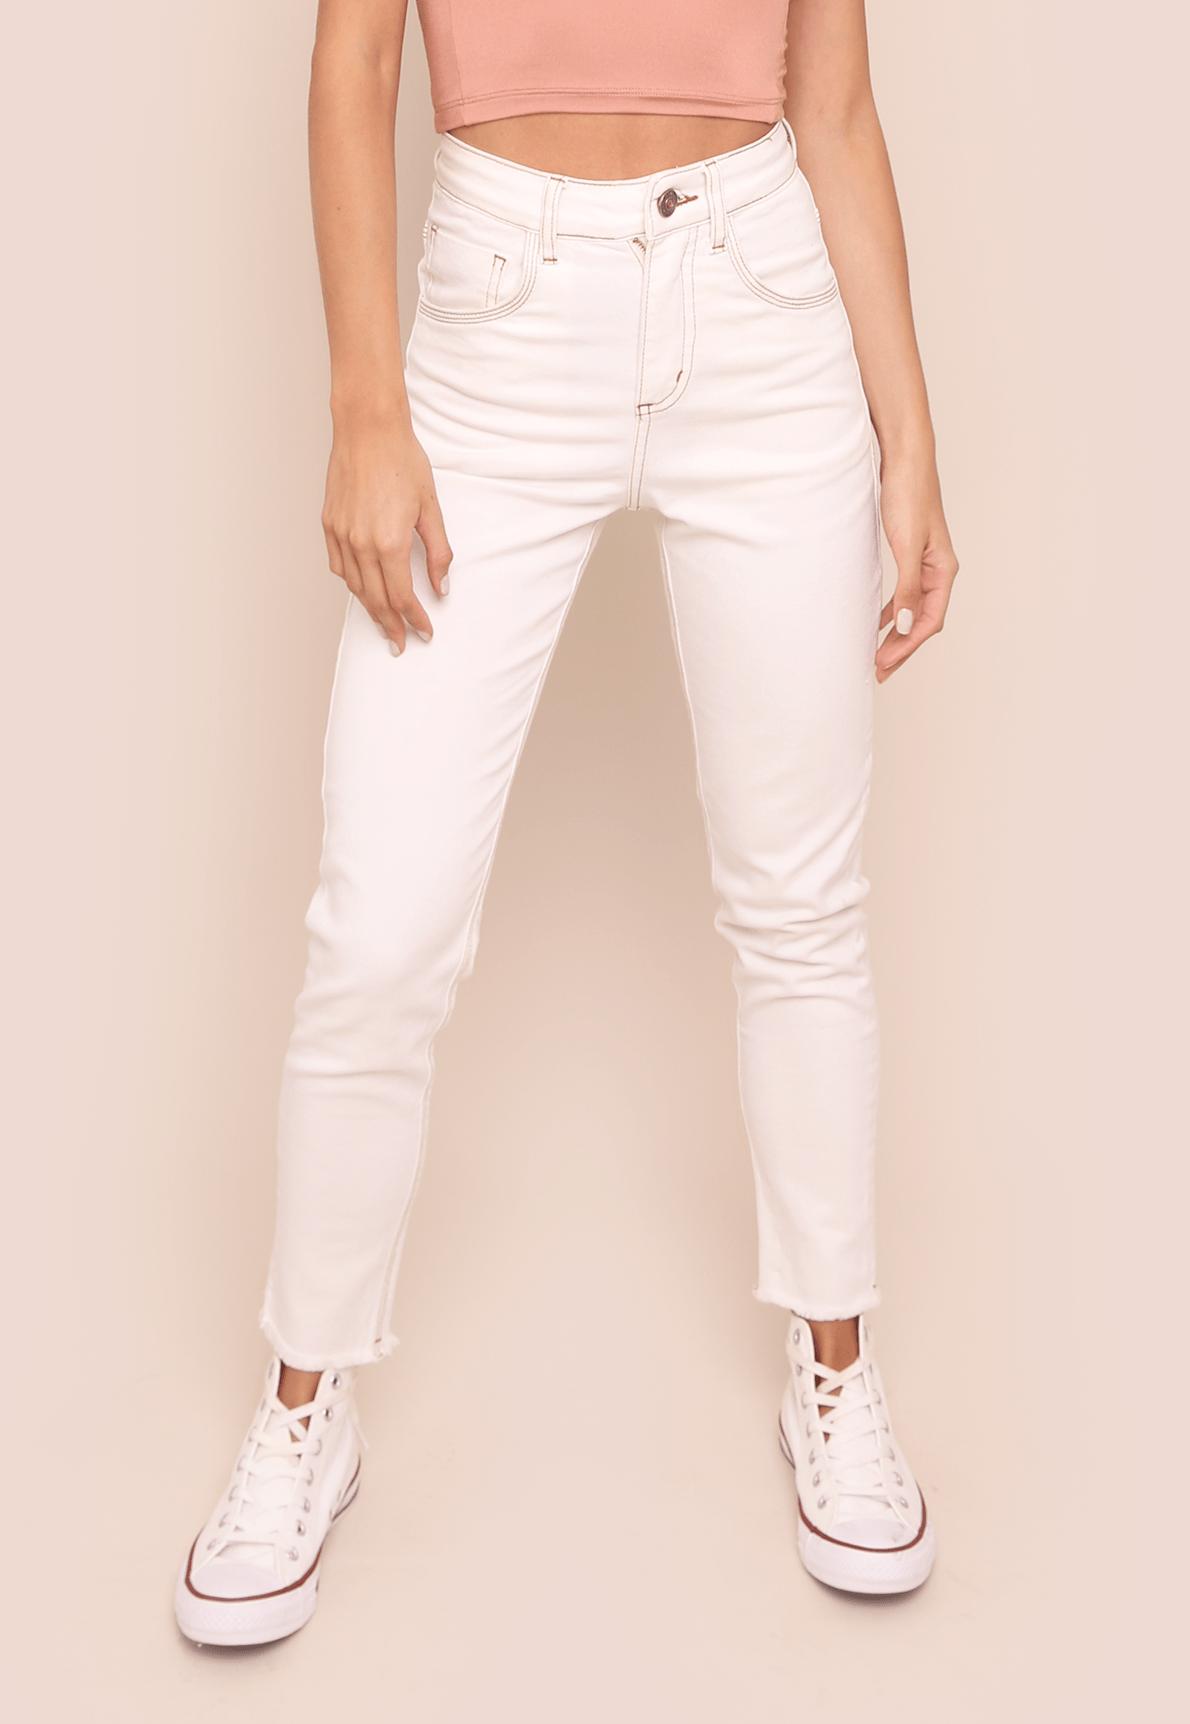 32701-Calca-Jeans-Califa-mundo-lolita-04